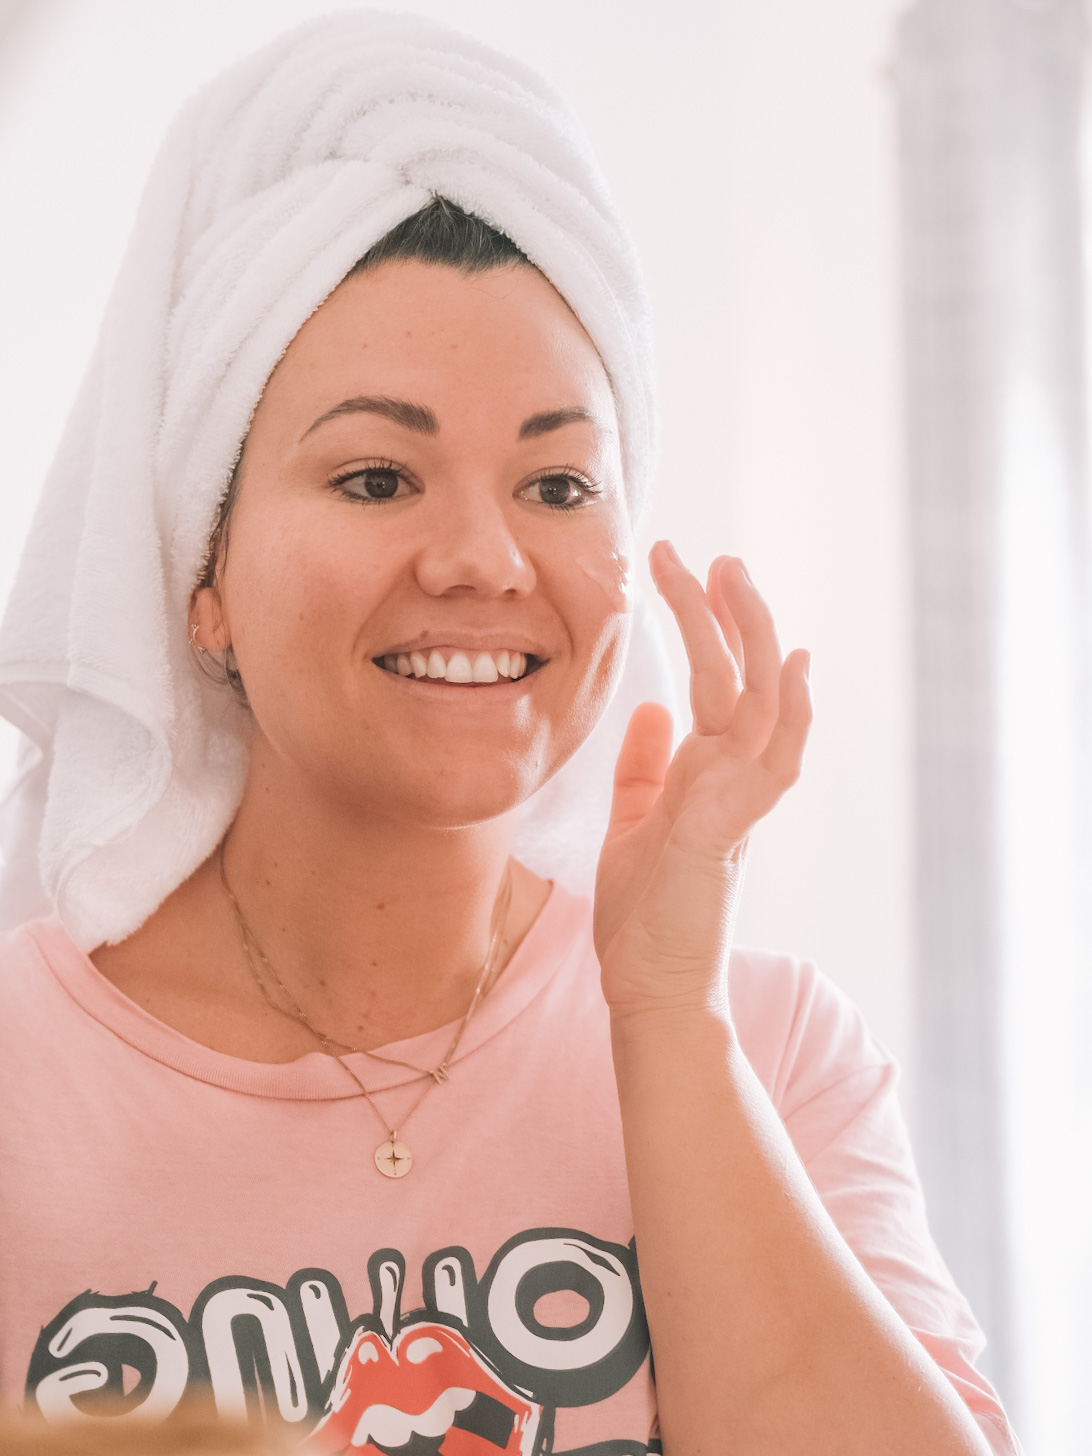 tailsofamermaid skincare routine lamelle